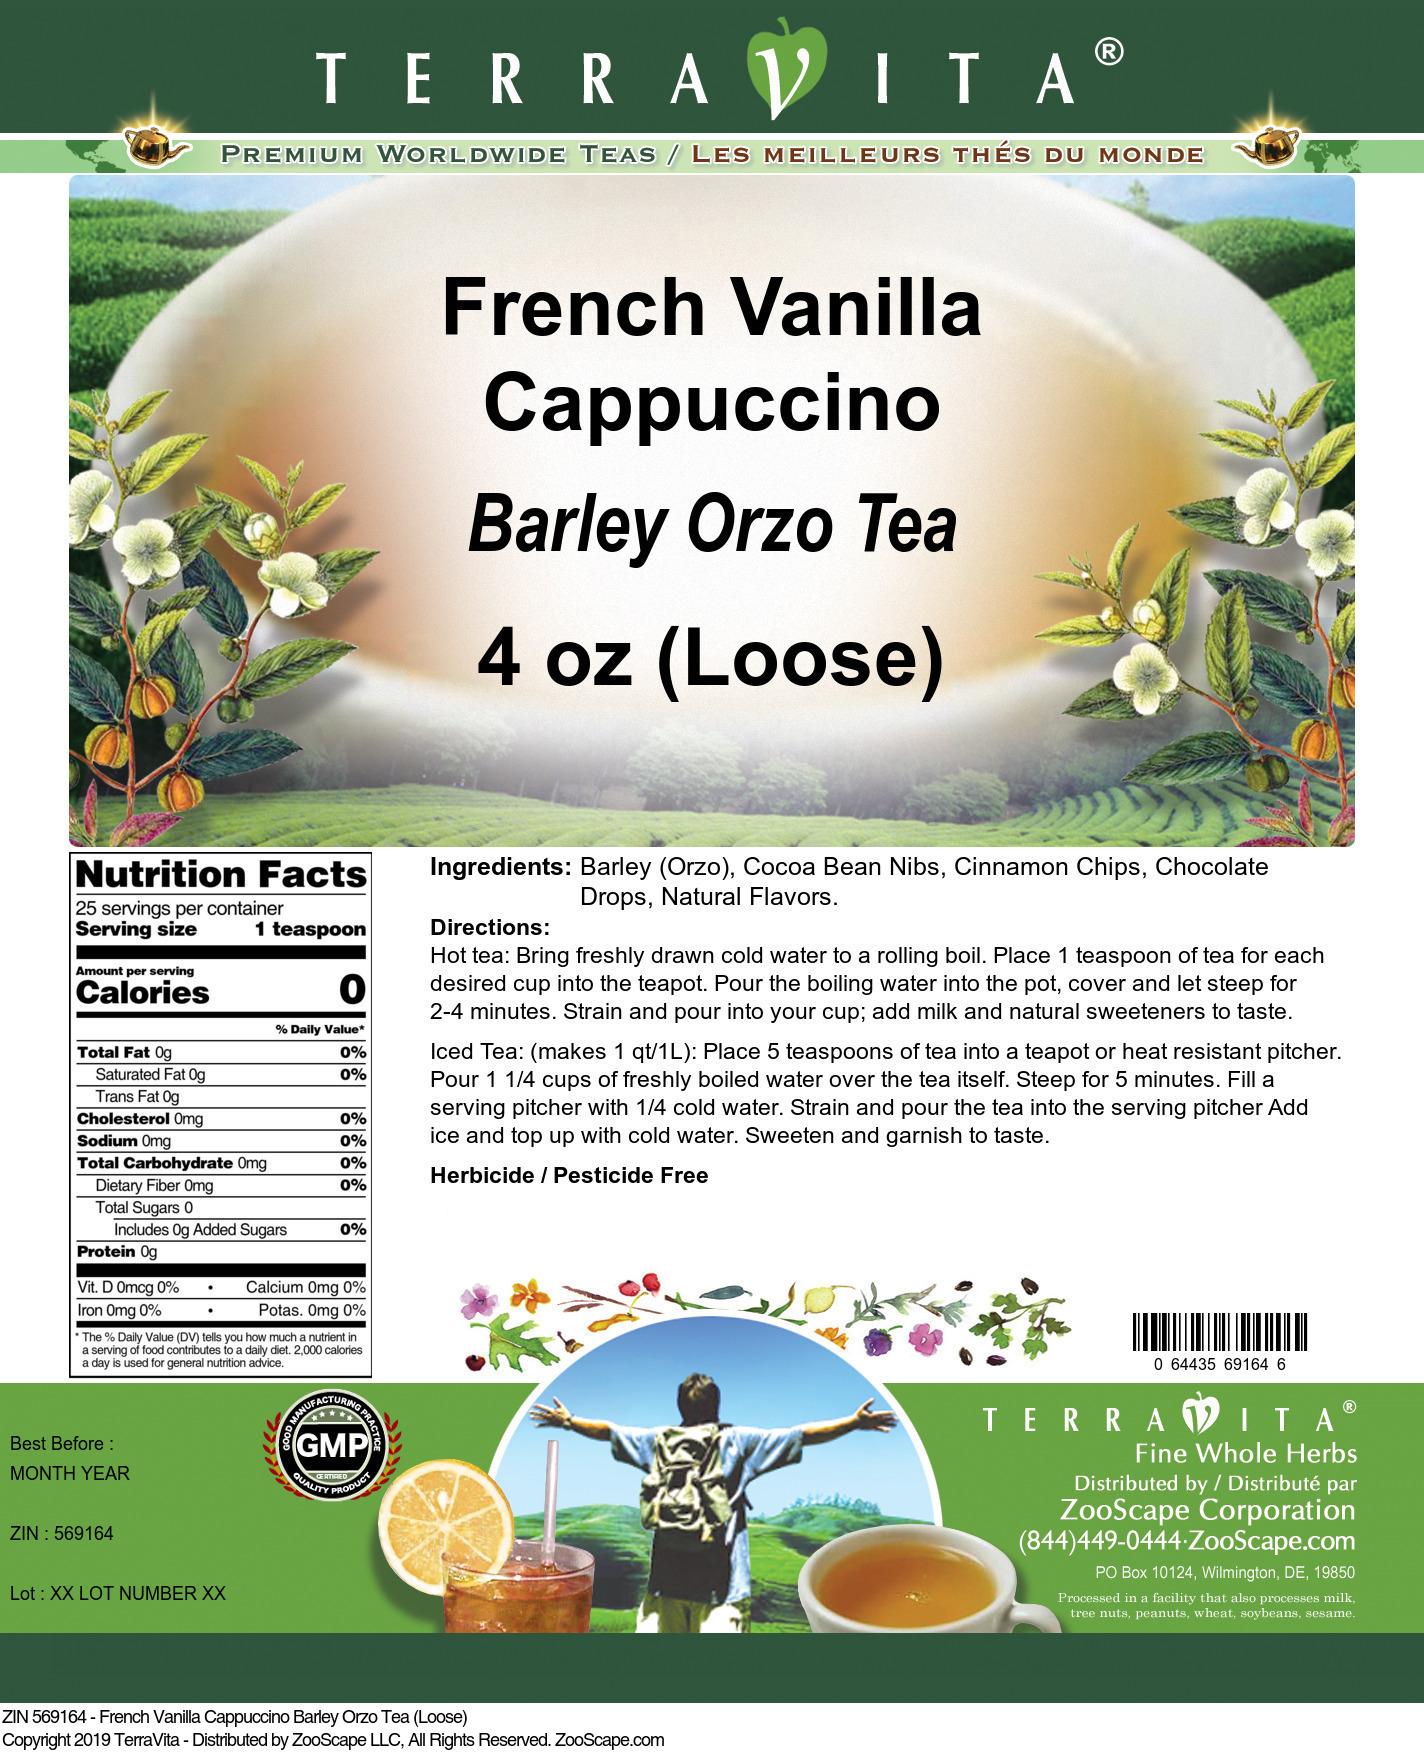 French Vanilla Cappuccino Barley Orzo